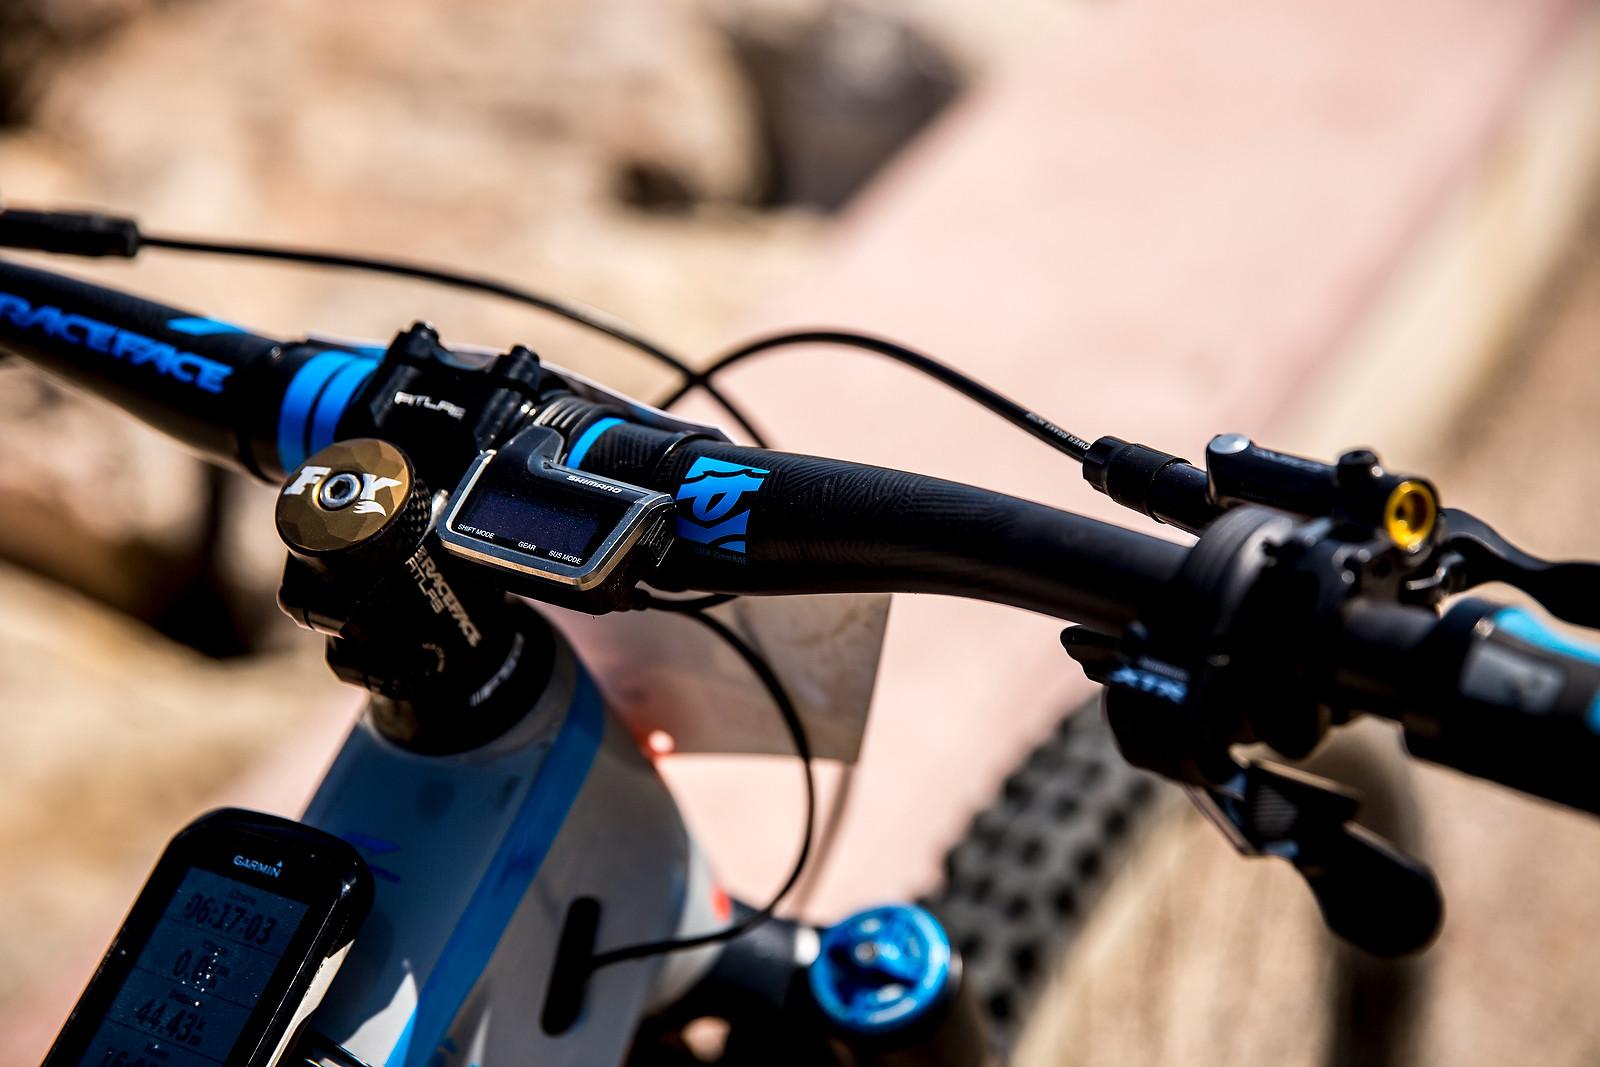 Nico Lau's Race Face Cockpit with XTR Di2 Controls - WINNING BIKE: Nico Lau's Cube Stereo 140 29 - Mountain Biking Pictures - Vital MTB